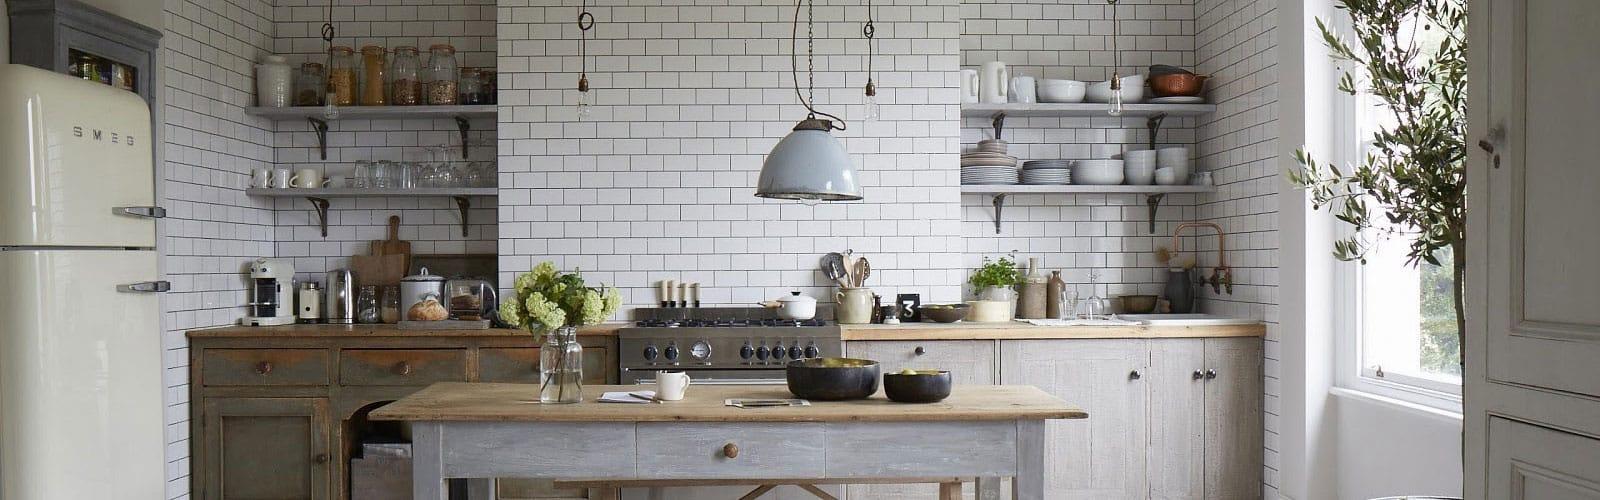 Vintage keuken | Retro keuken | Eigenhuis Keukens